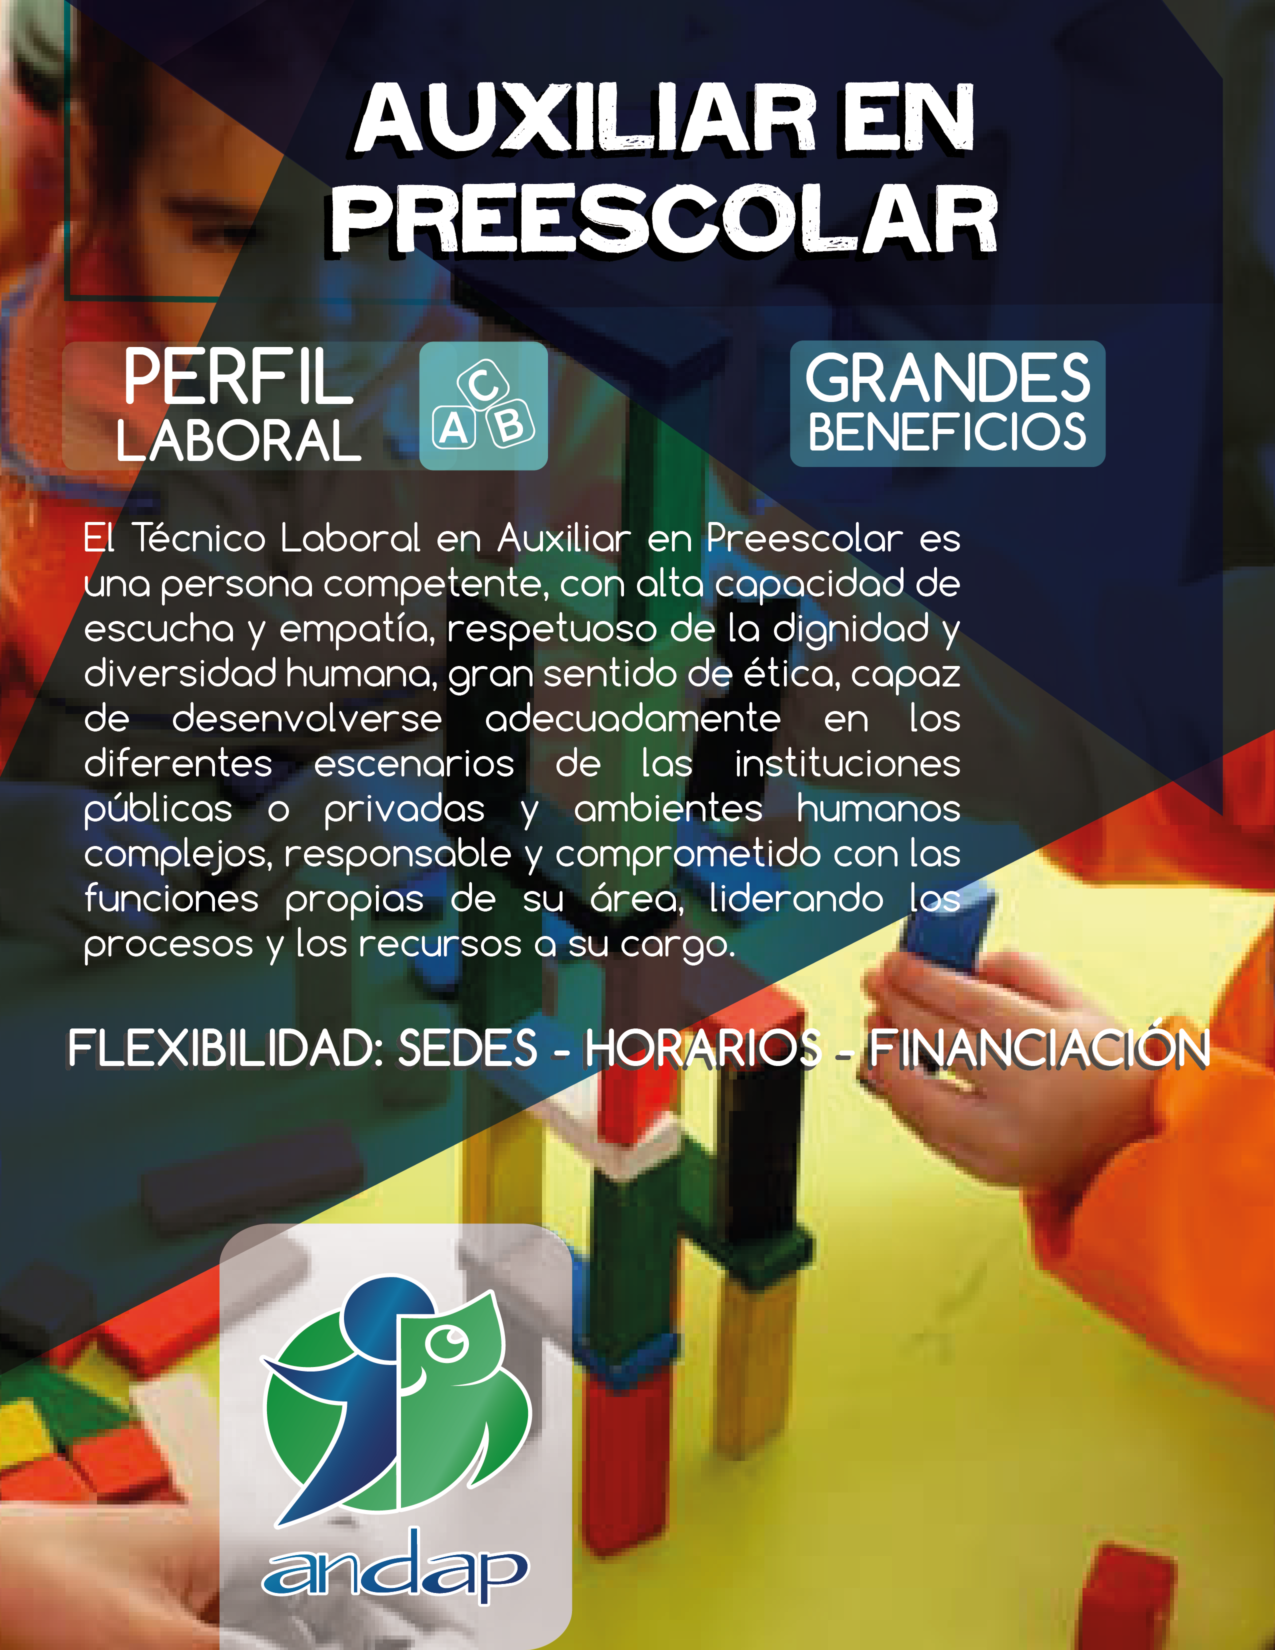 Auxiliar en Preescolar